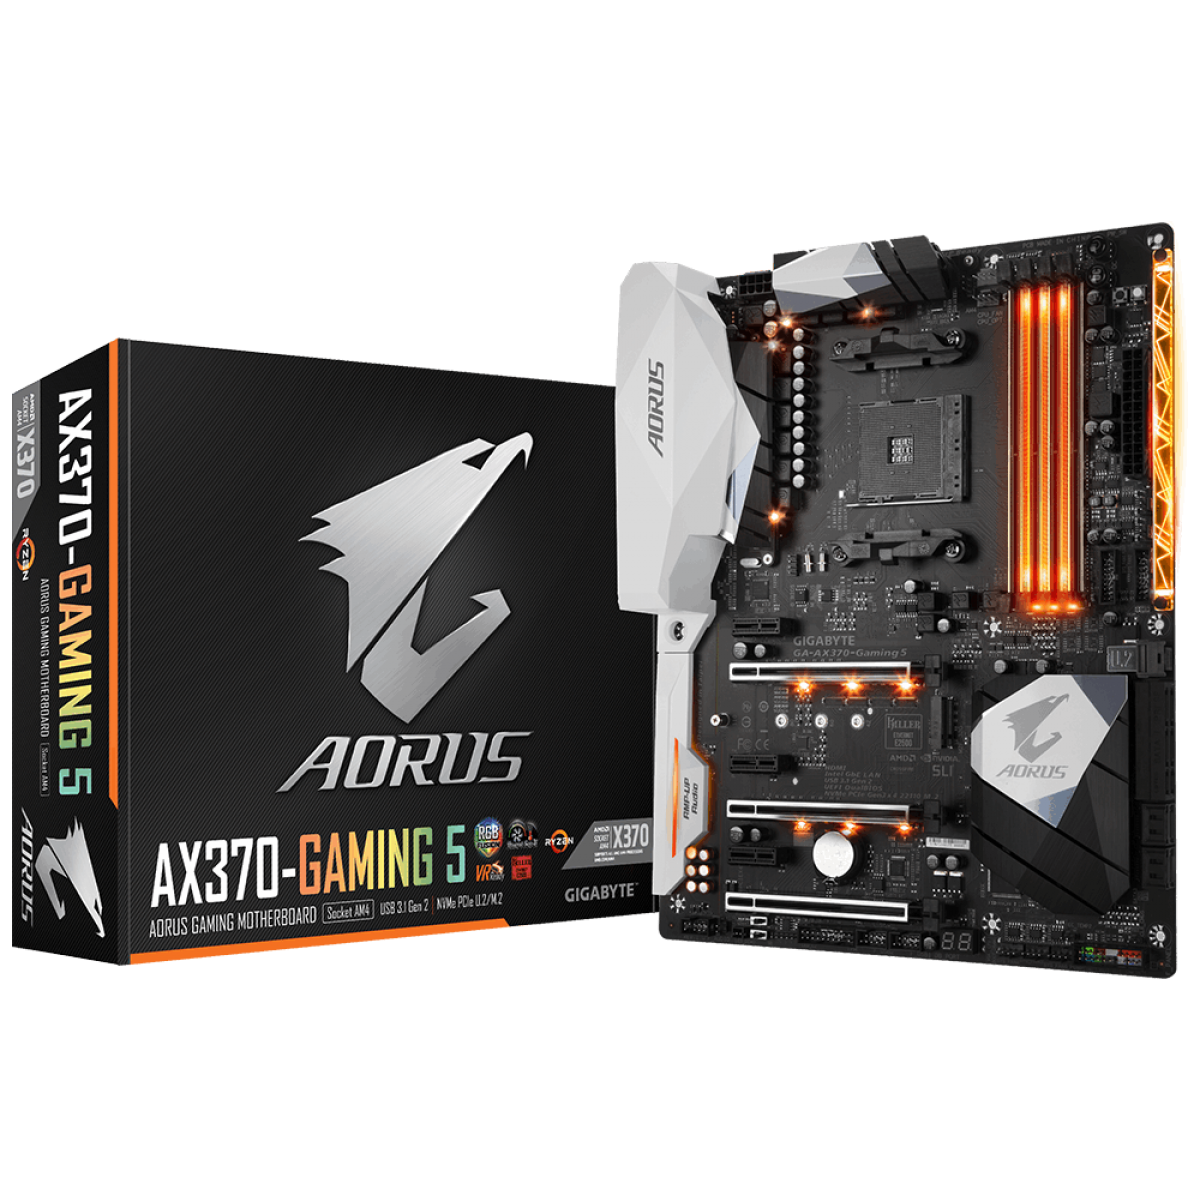 Placa Mãe Gigabyte AORUS GA-AX370-GAMING 5, Chipset X370, AMD AM4, ATX, DDR4